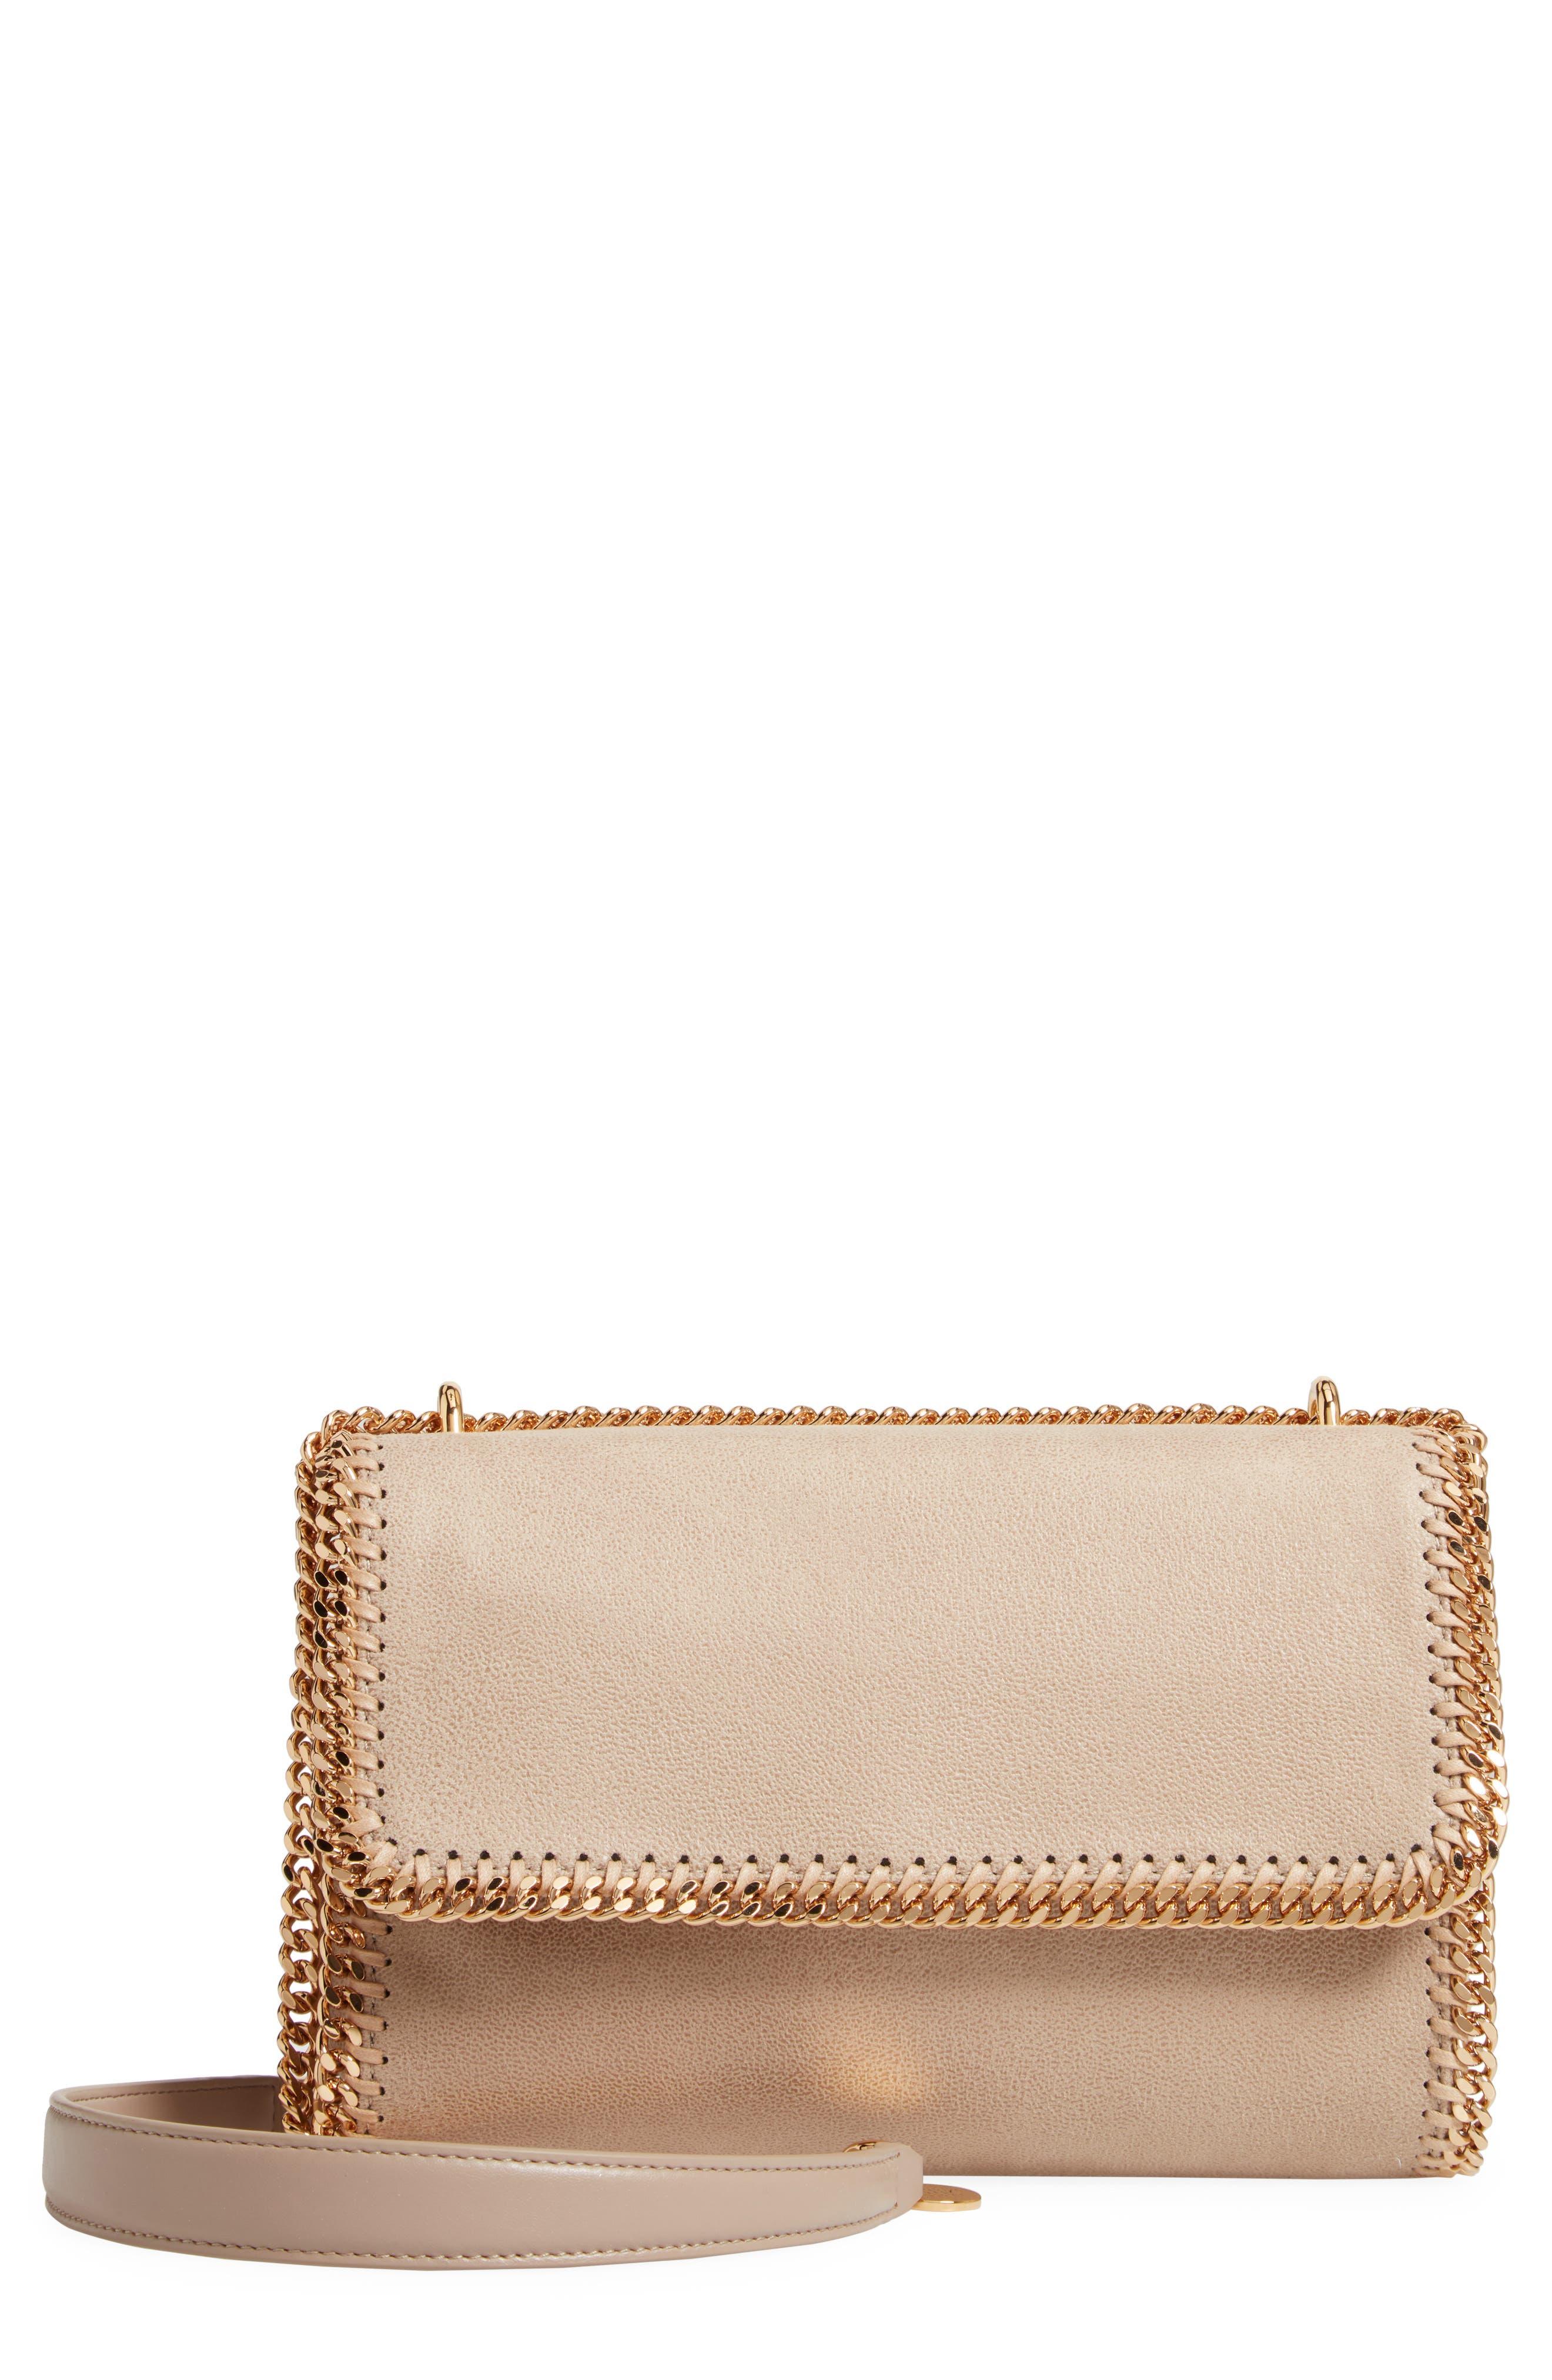 STELLA MCCARTNEY, Falabella Shaggy Deer Faux Leather Shoulder Bag, Main thumbnail 1, color, CLOTTED CREAM